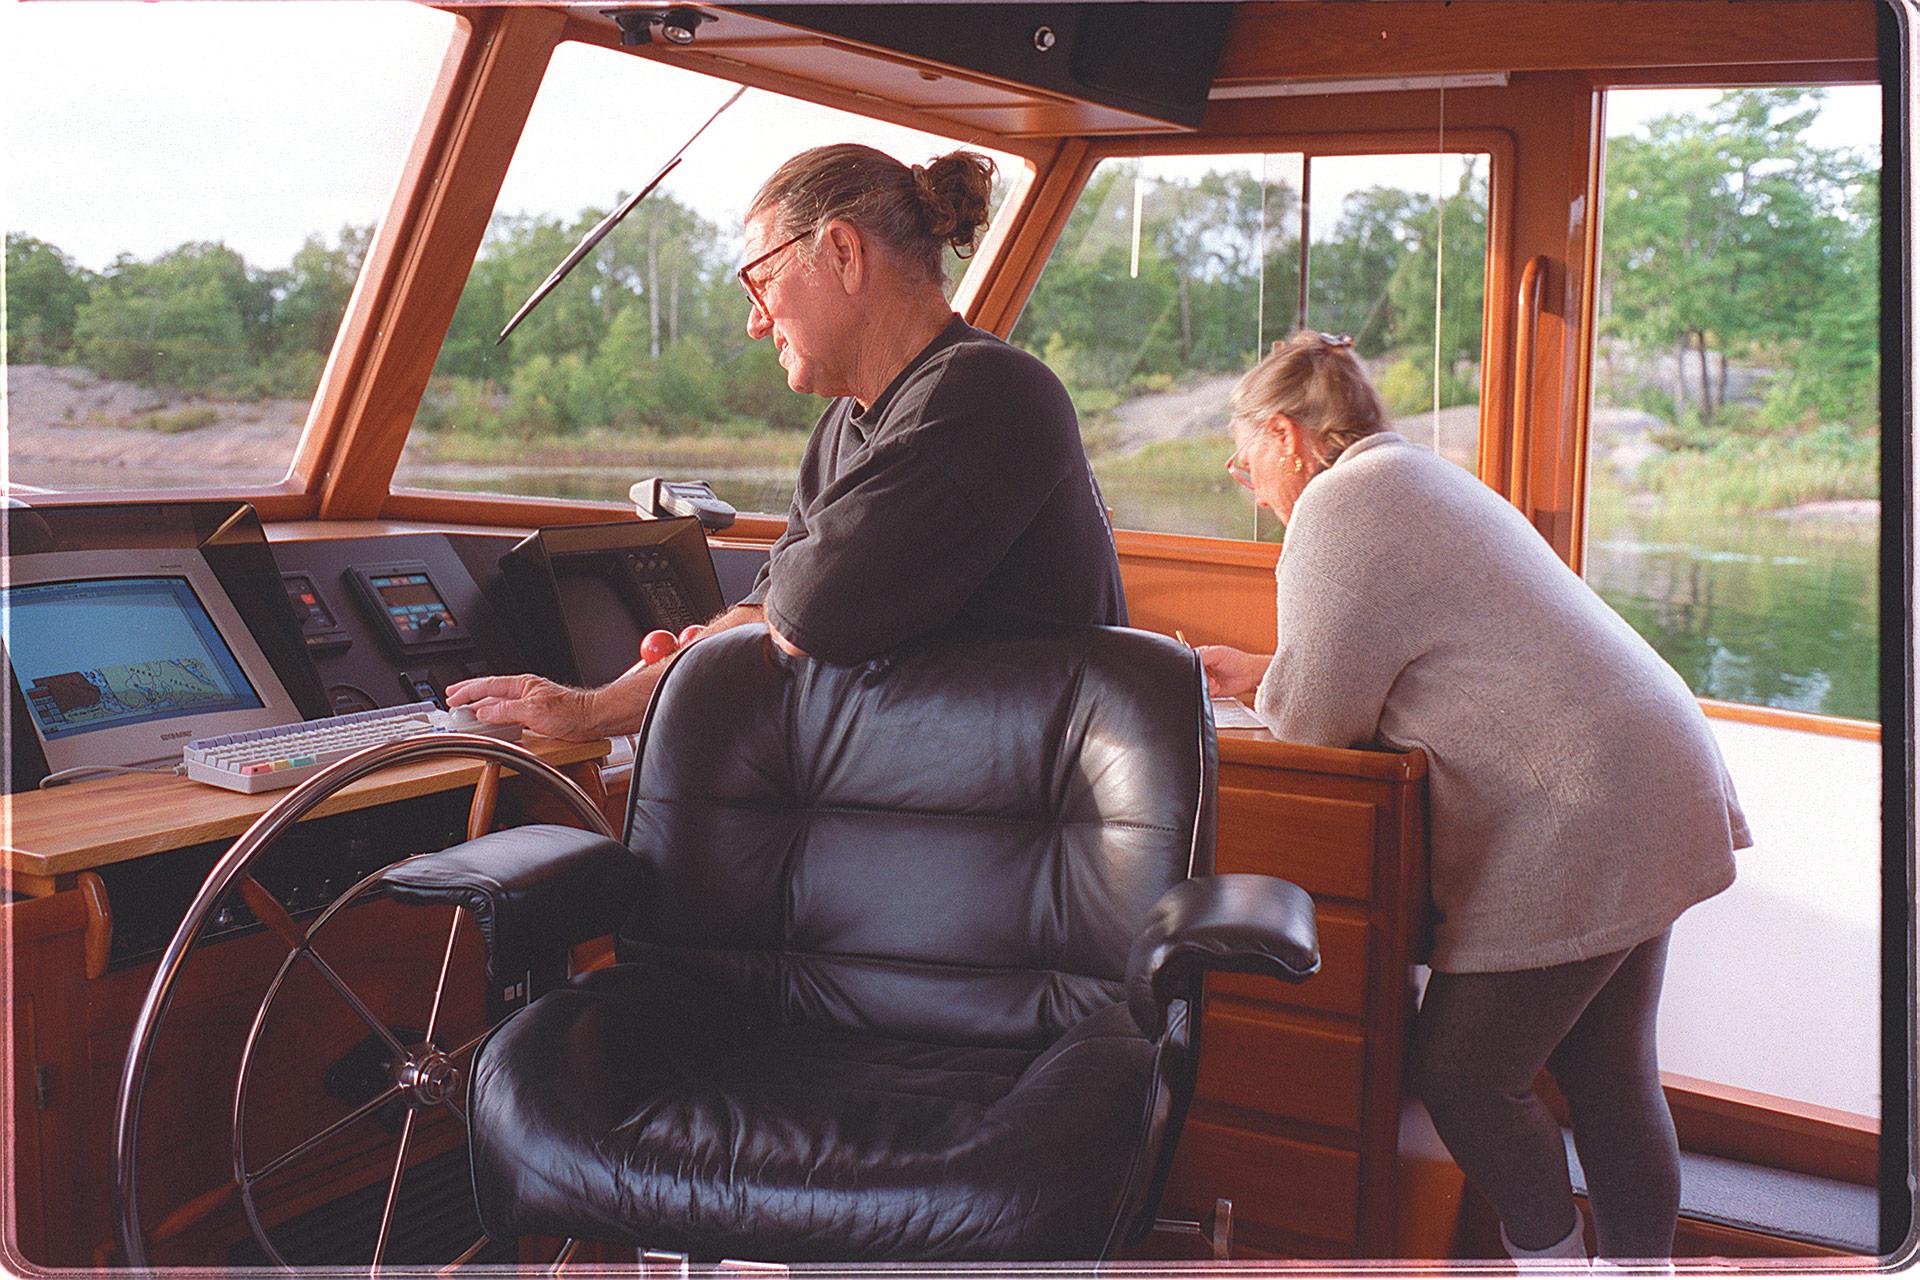 american_windsurfer_4.4_hoyle_schweitzer_cockpit